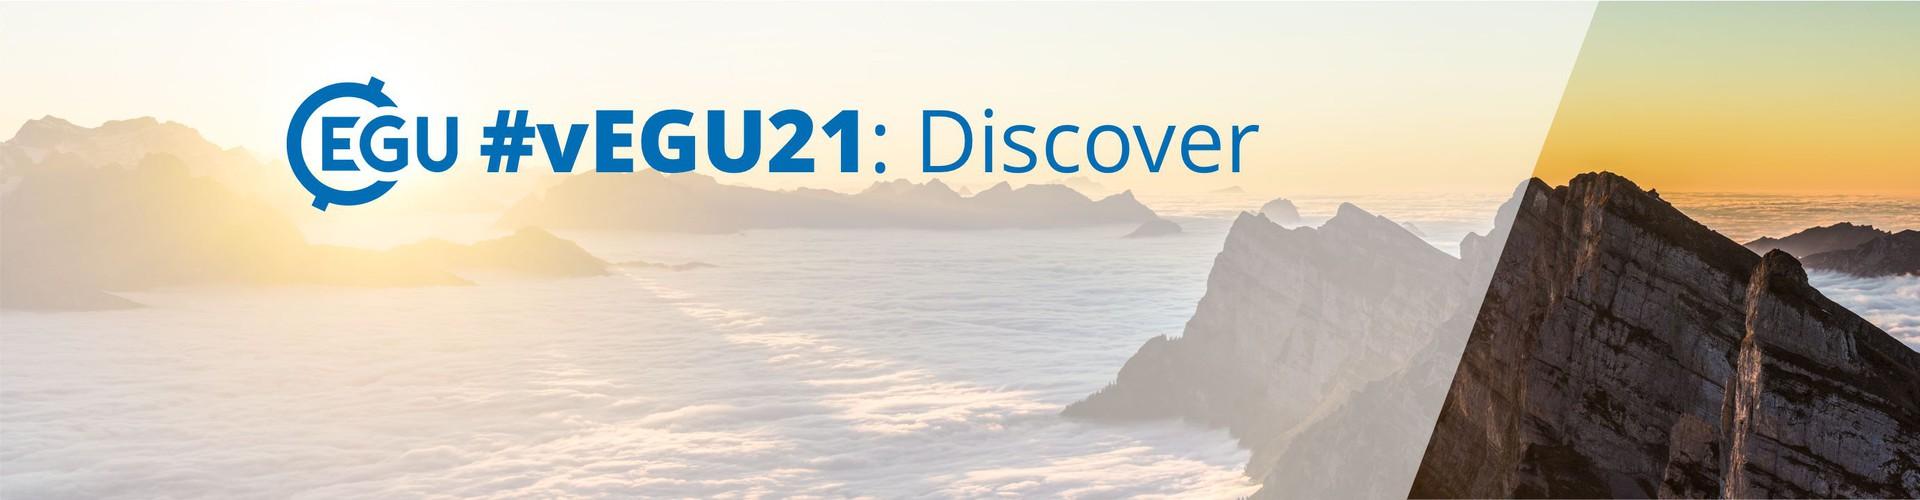 vEGU21 discover banner (Credit: Jonas Igel via Imaggeo)